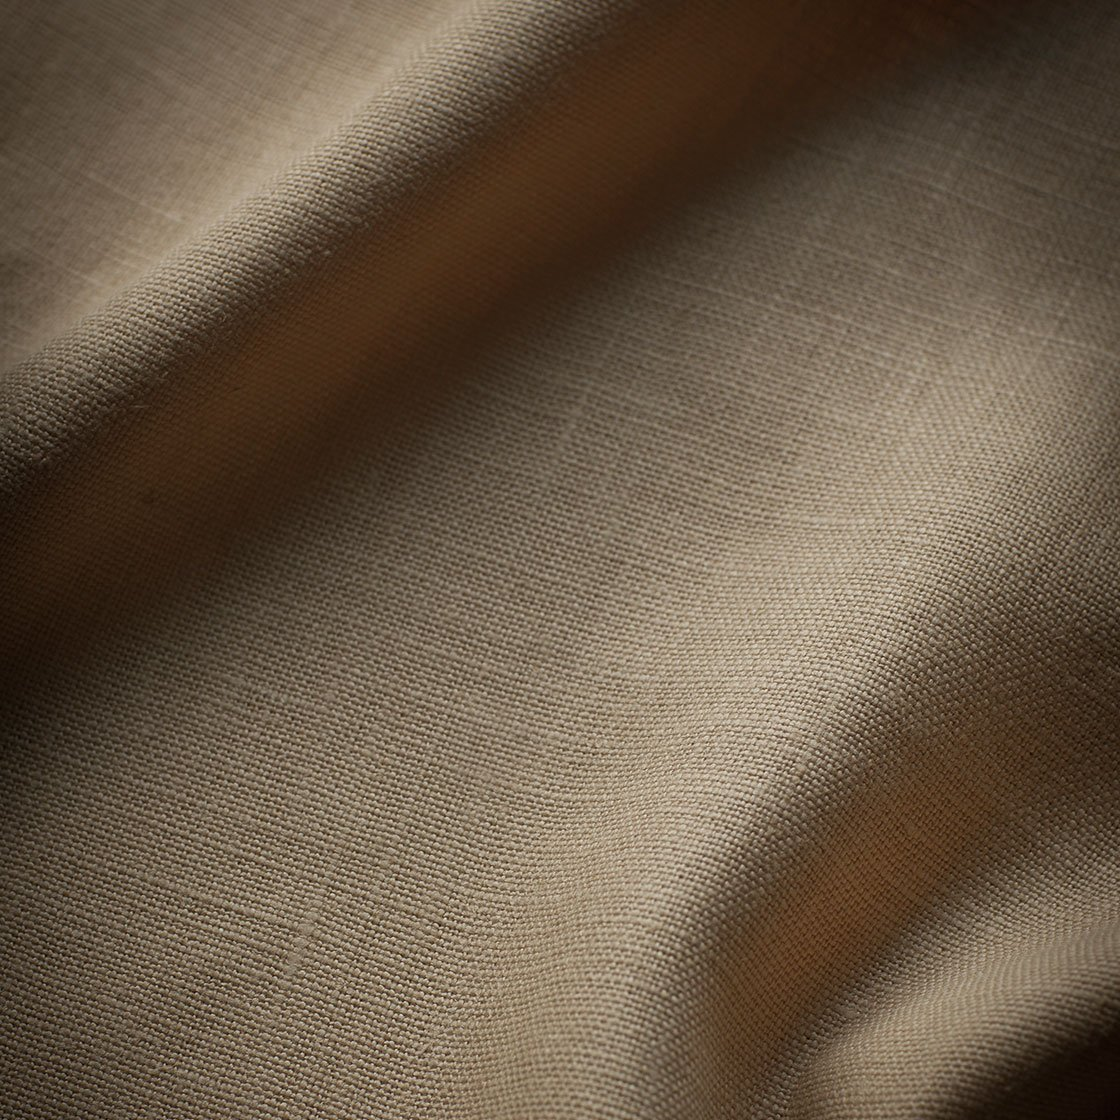 Bantry Linen - Dark Honey - Beaumont & Fletcher - Beaumont & Fletcher